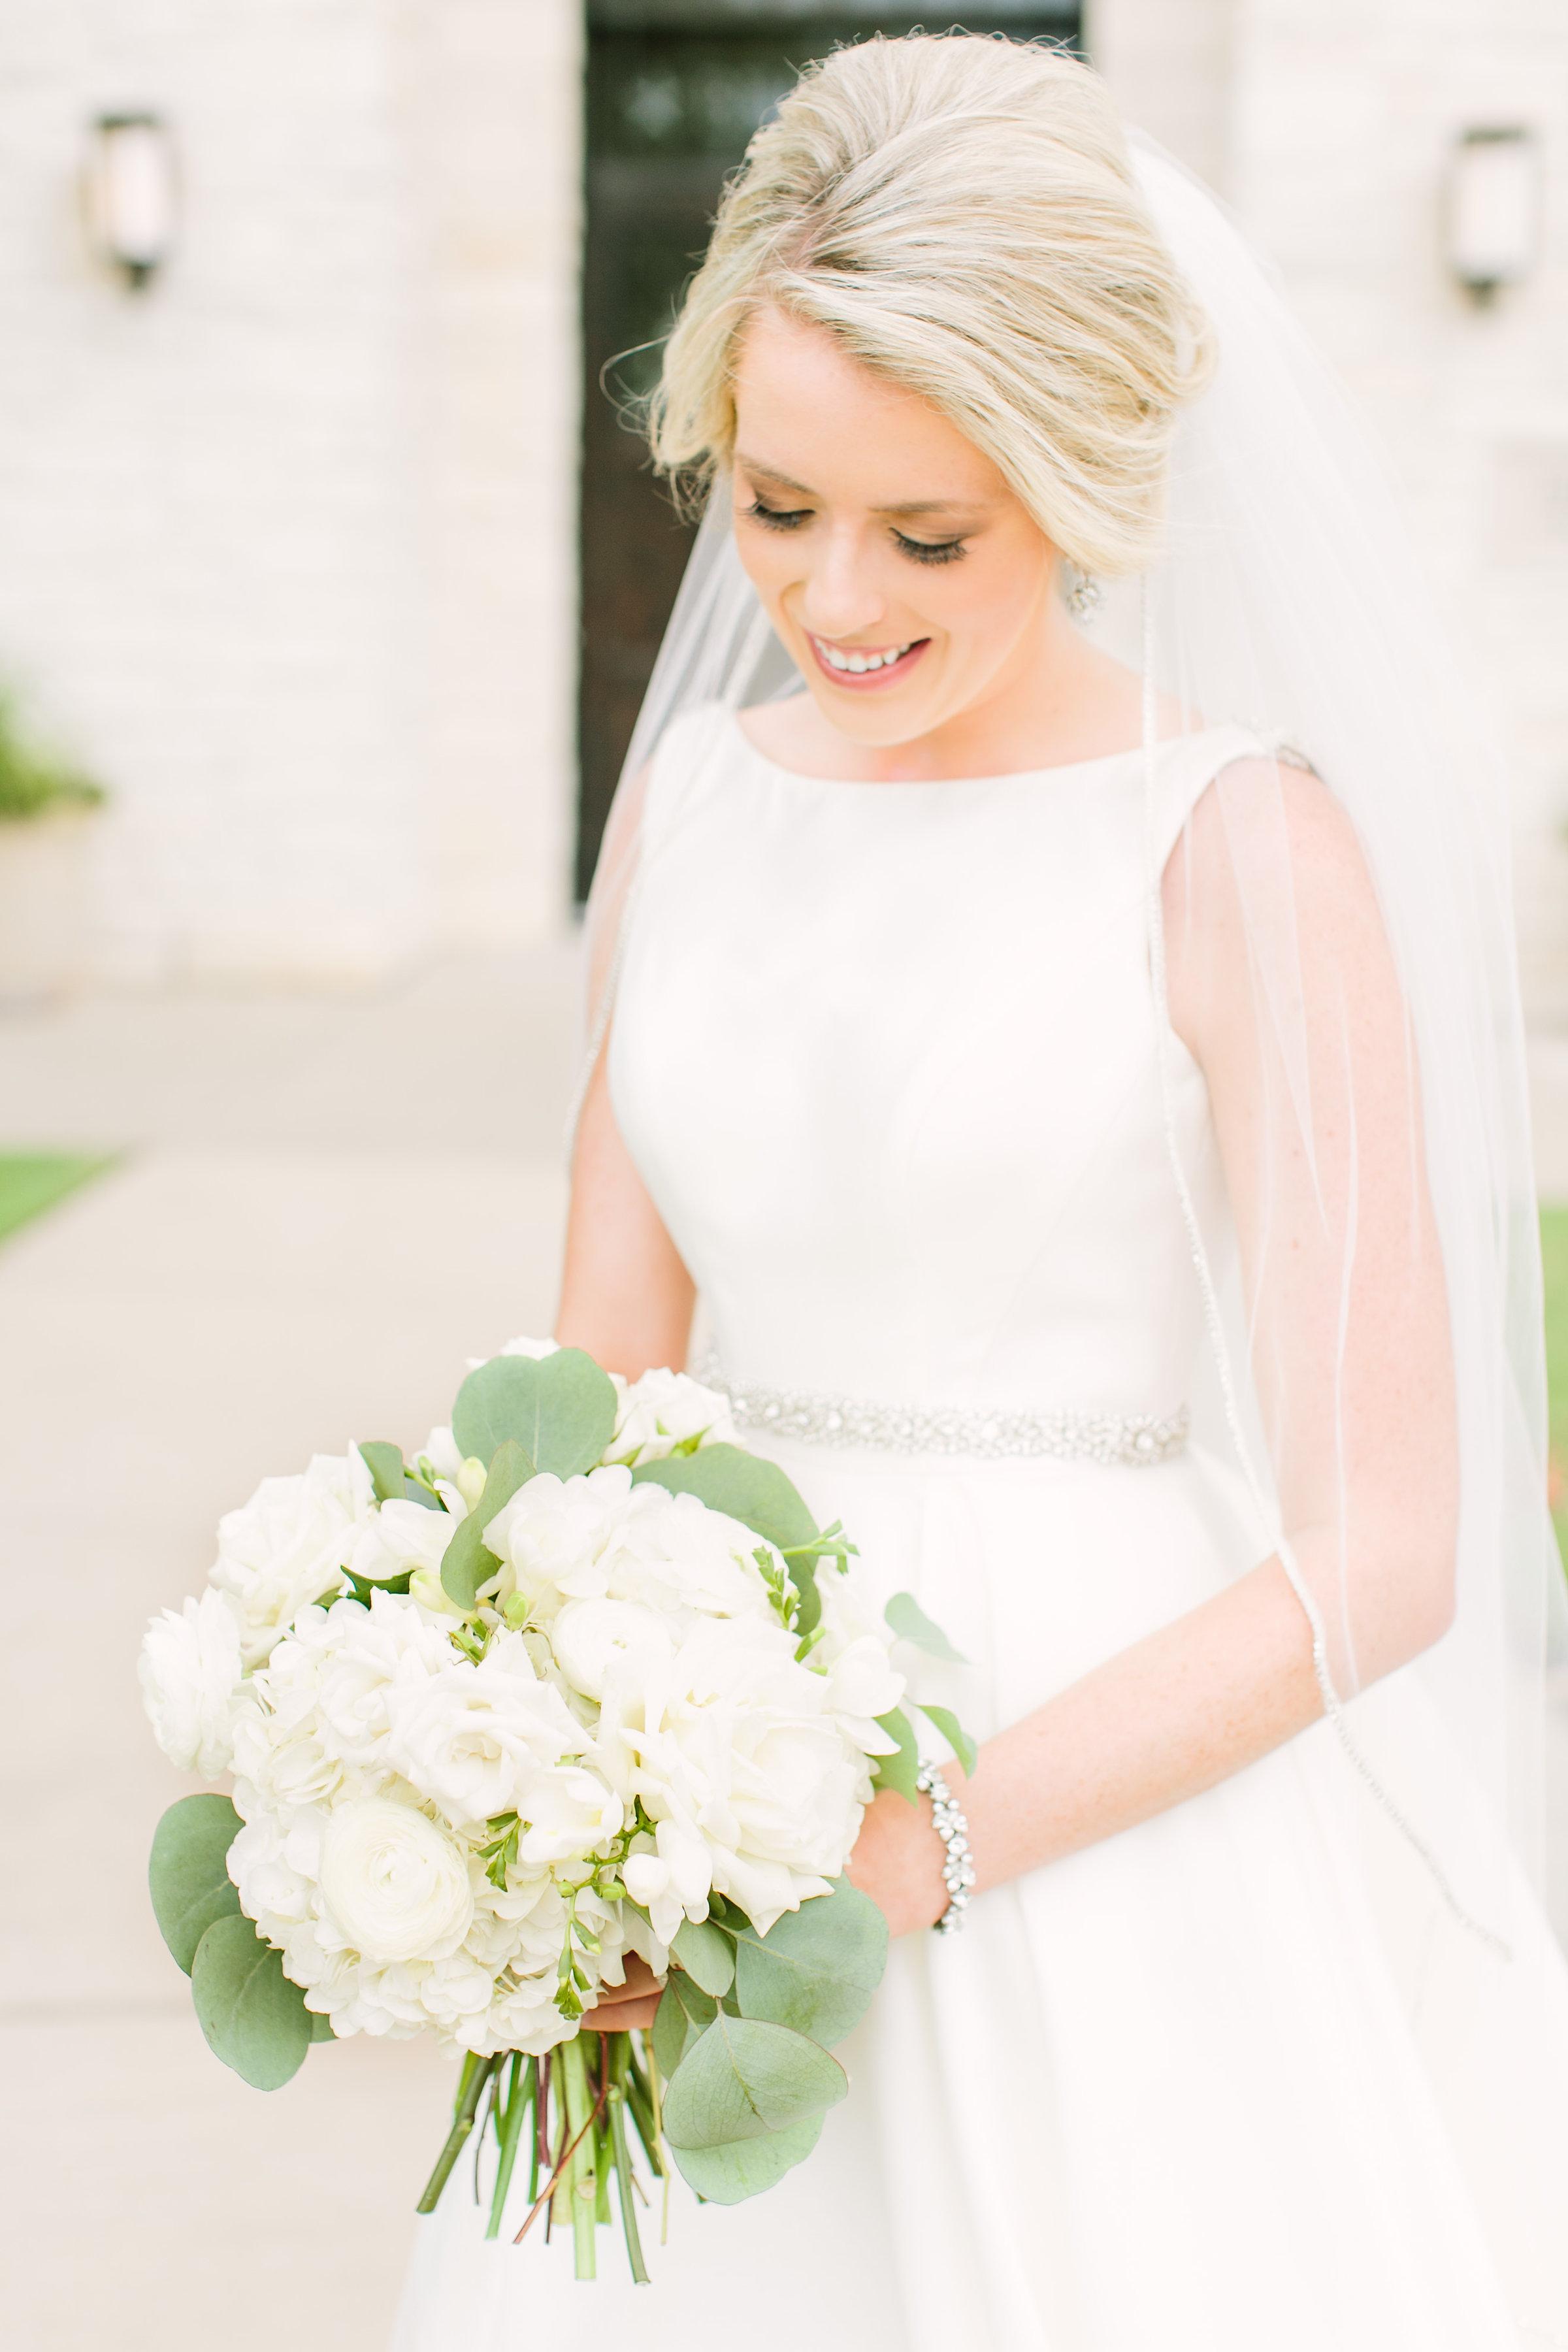 bride-briscoe-manor-white-greenery-bouquet-by-maxit-flower-design-in-houston-texas